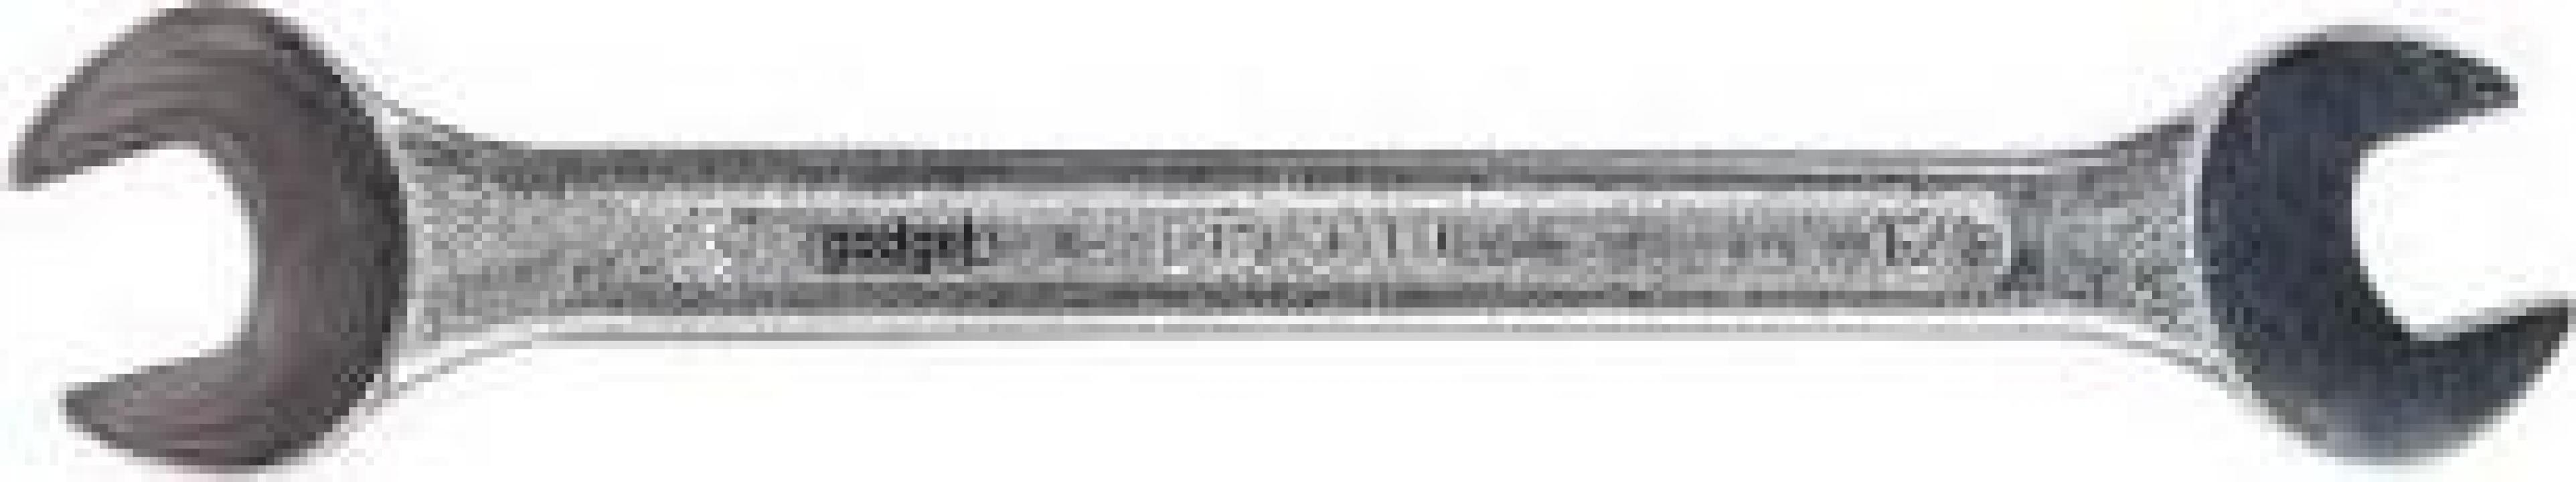 Cheie fixa CR-V, 14x15mm, Gadget 230326